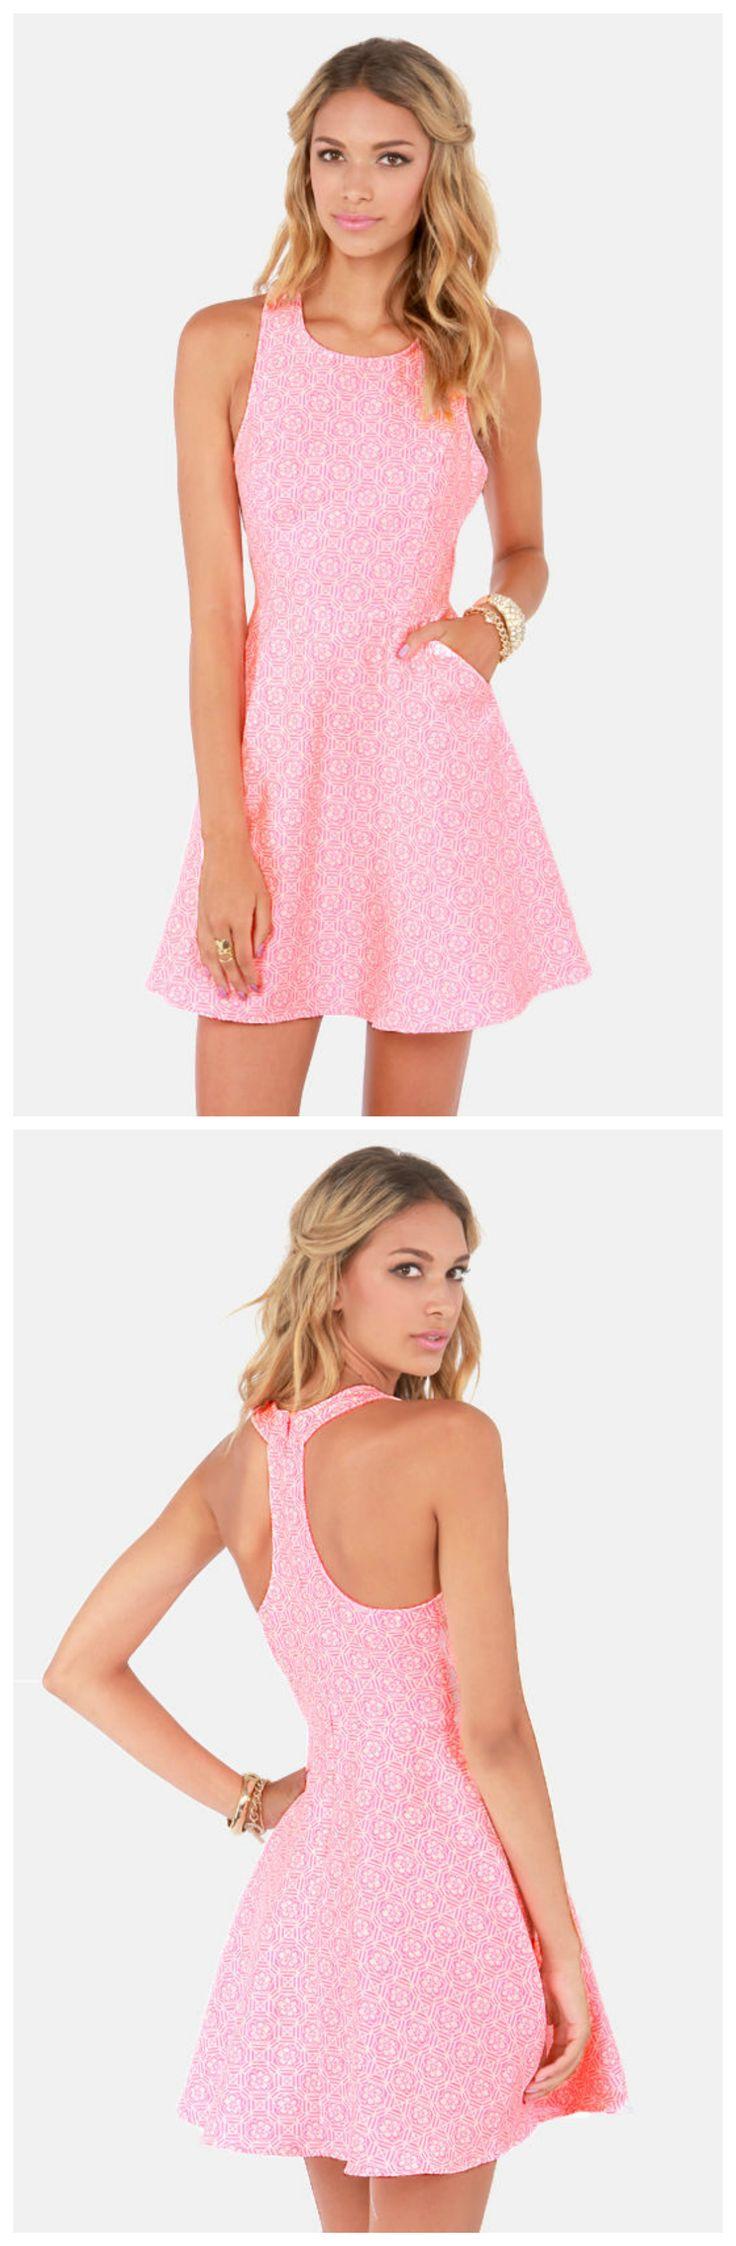 A Brocade Of Fortunes Neon Pink Dress via lulus.com